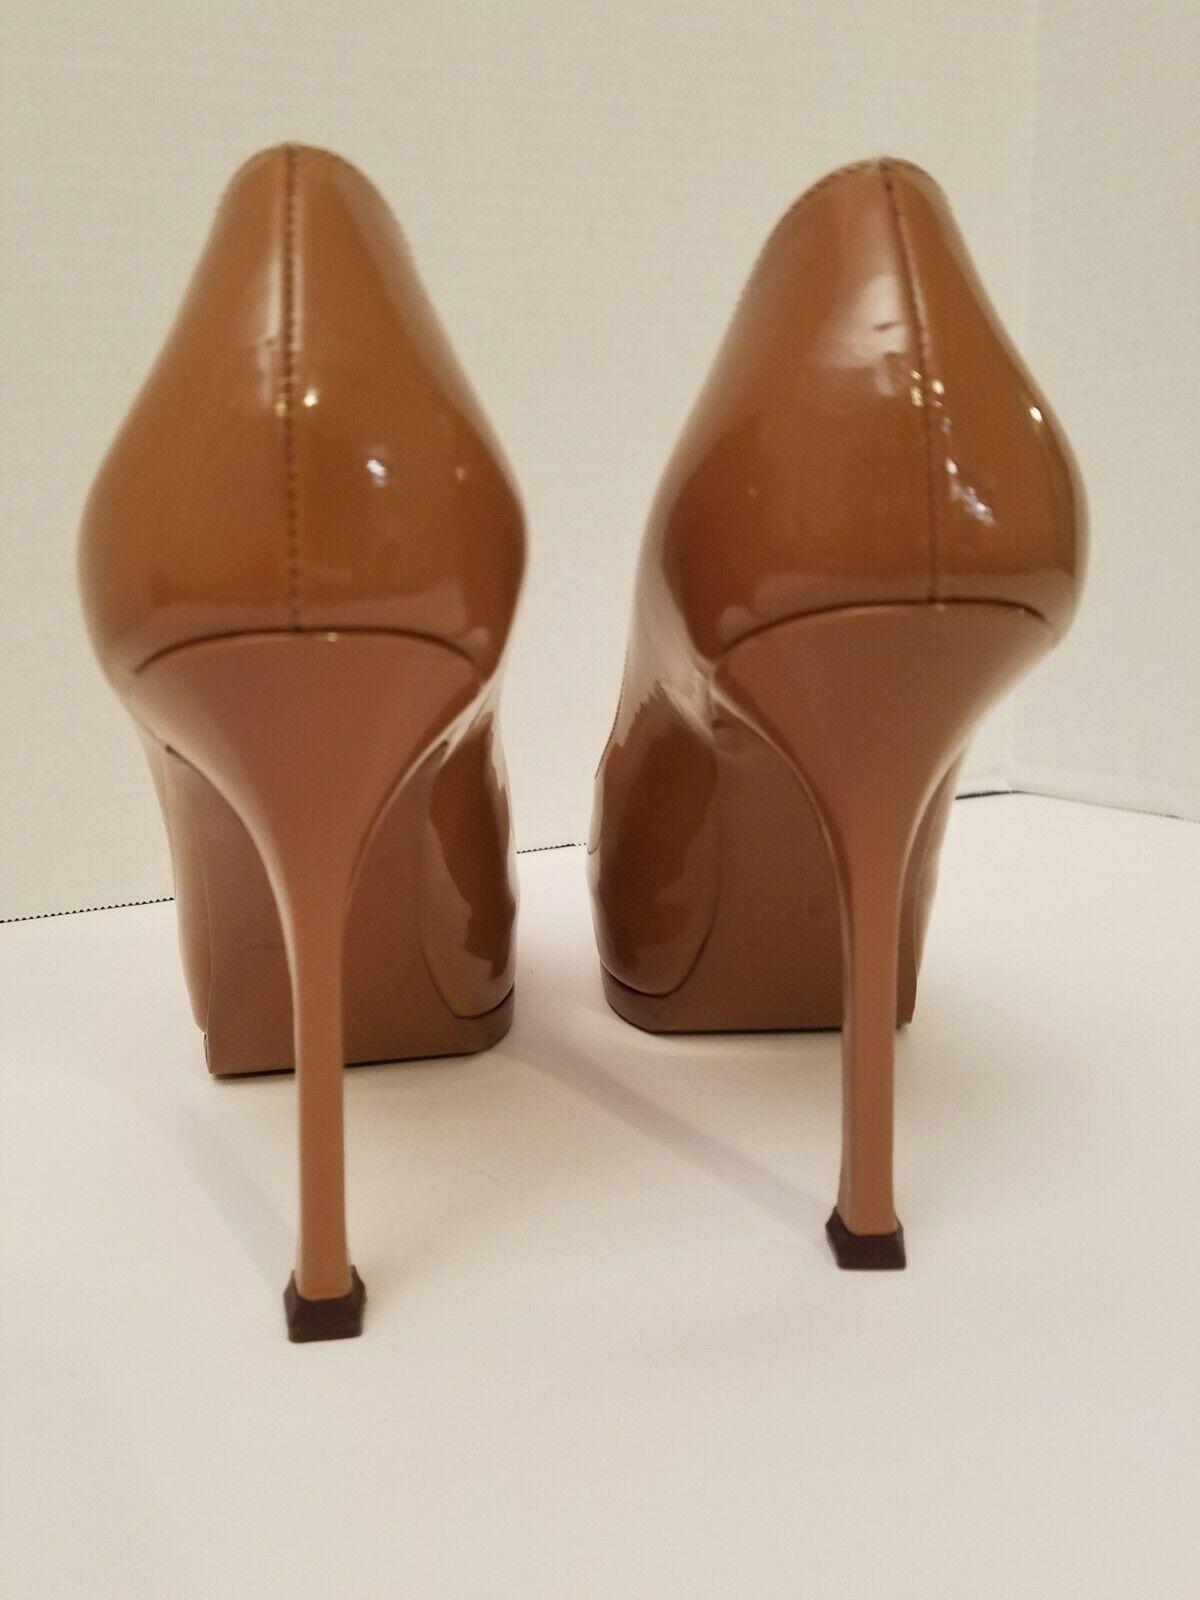 YSL Tribtoo Nude Patent Leather Platform Pumps 6/… - image 5